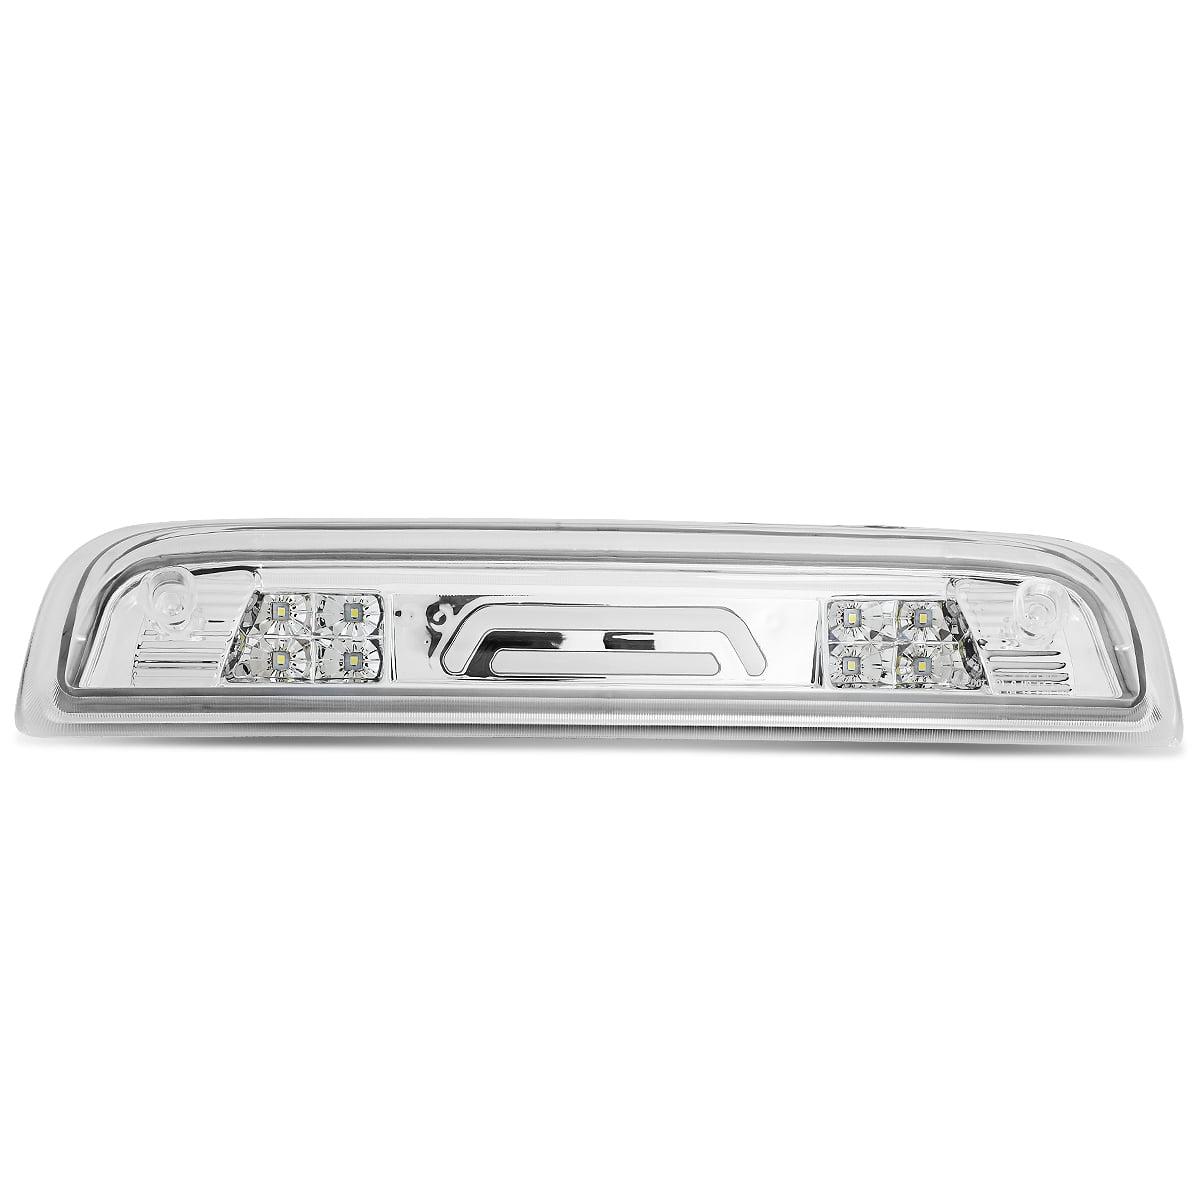 For 14-18 Chevy Silverado / GMC Sierra High Mount 3D LED 3rd Third Brake Light / Cargo Lamp (Chrome Clear)